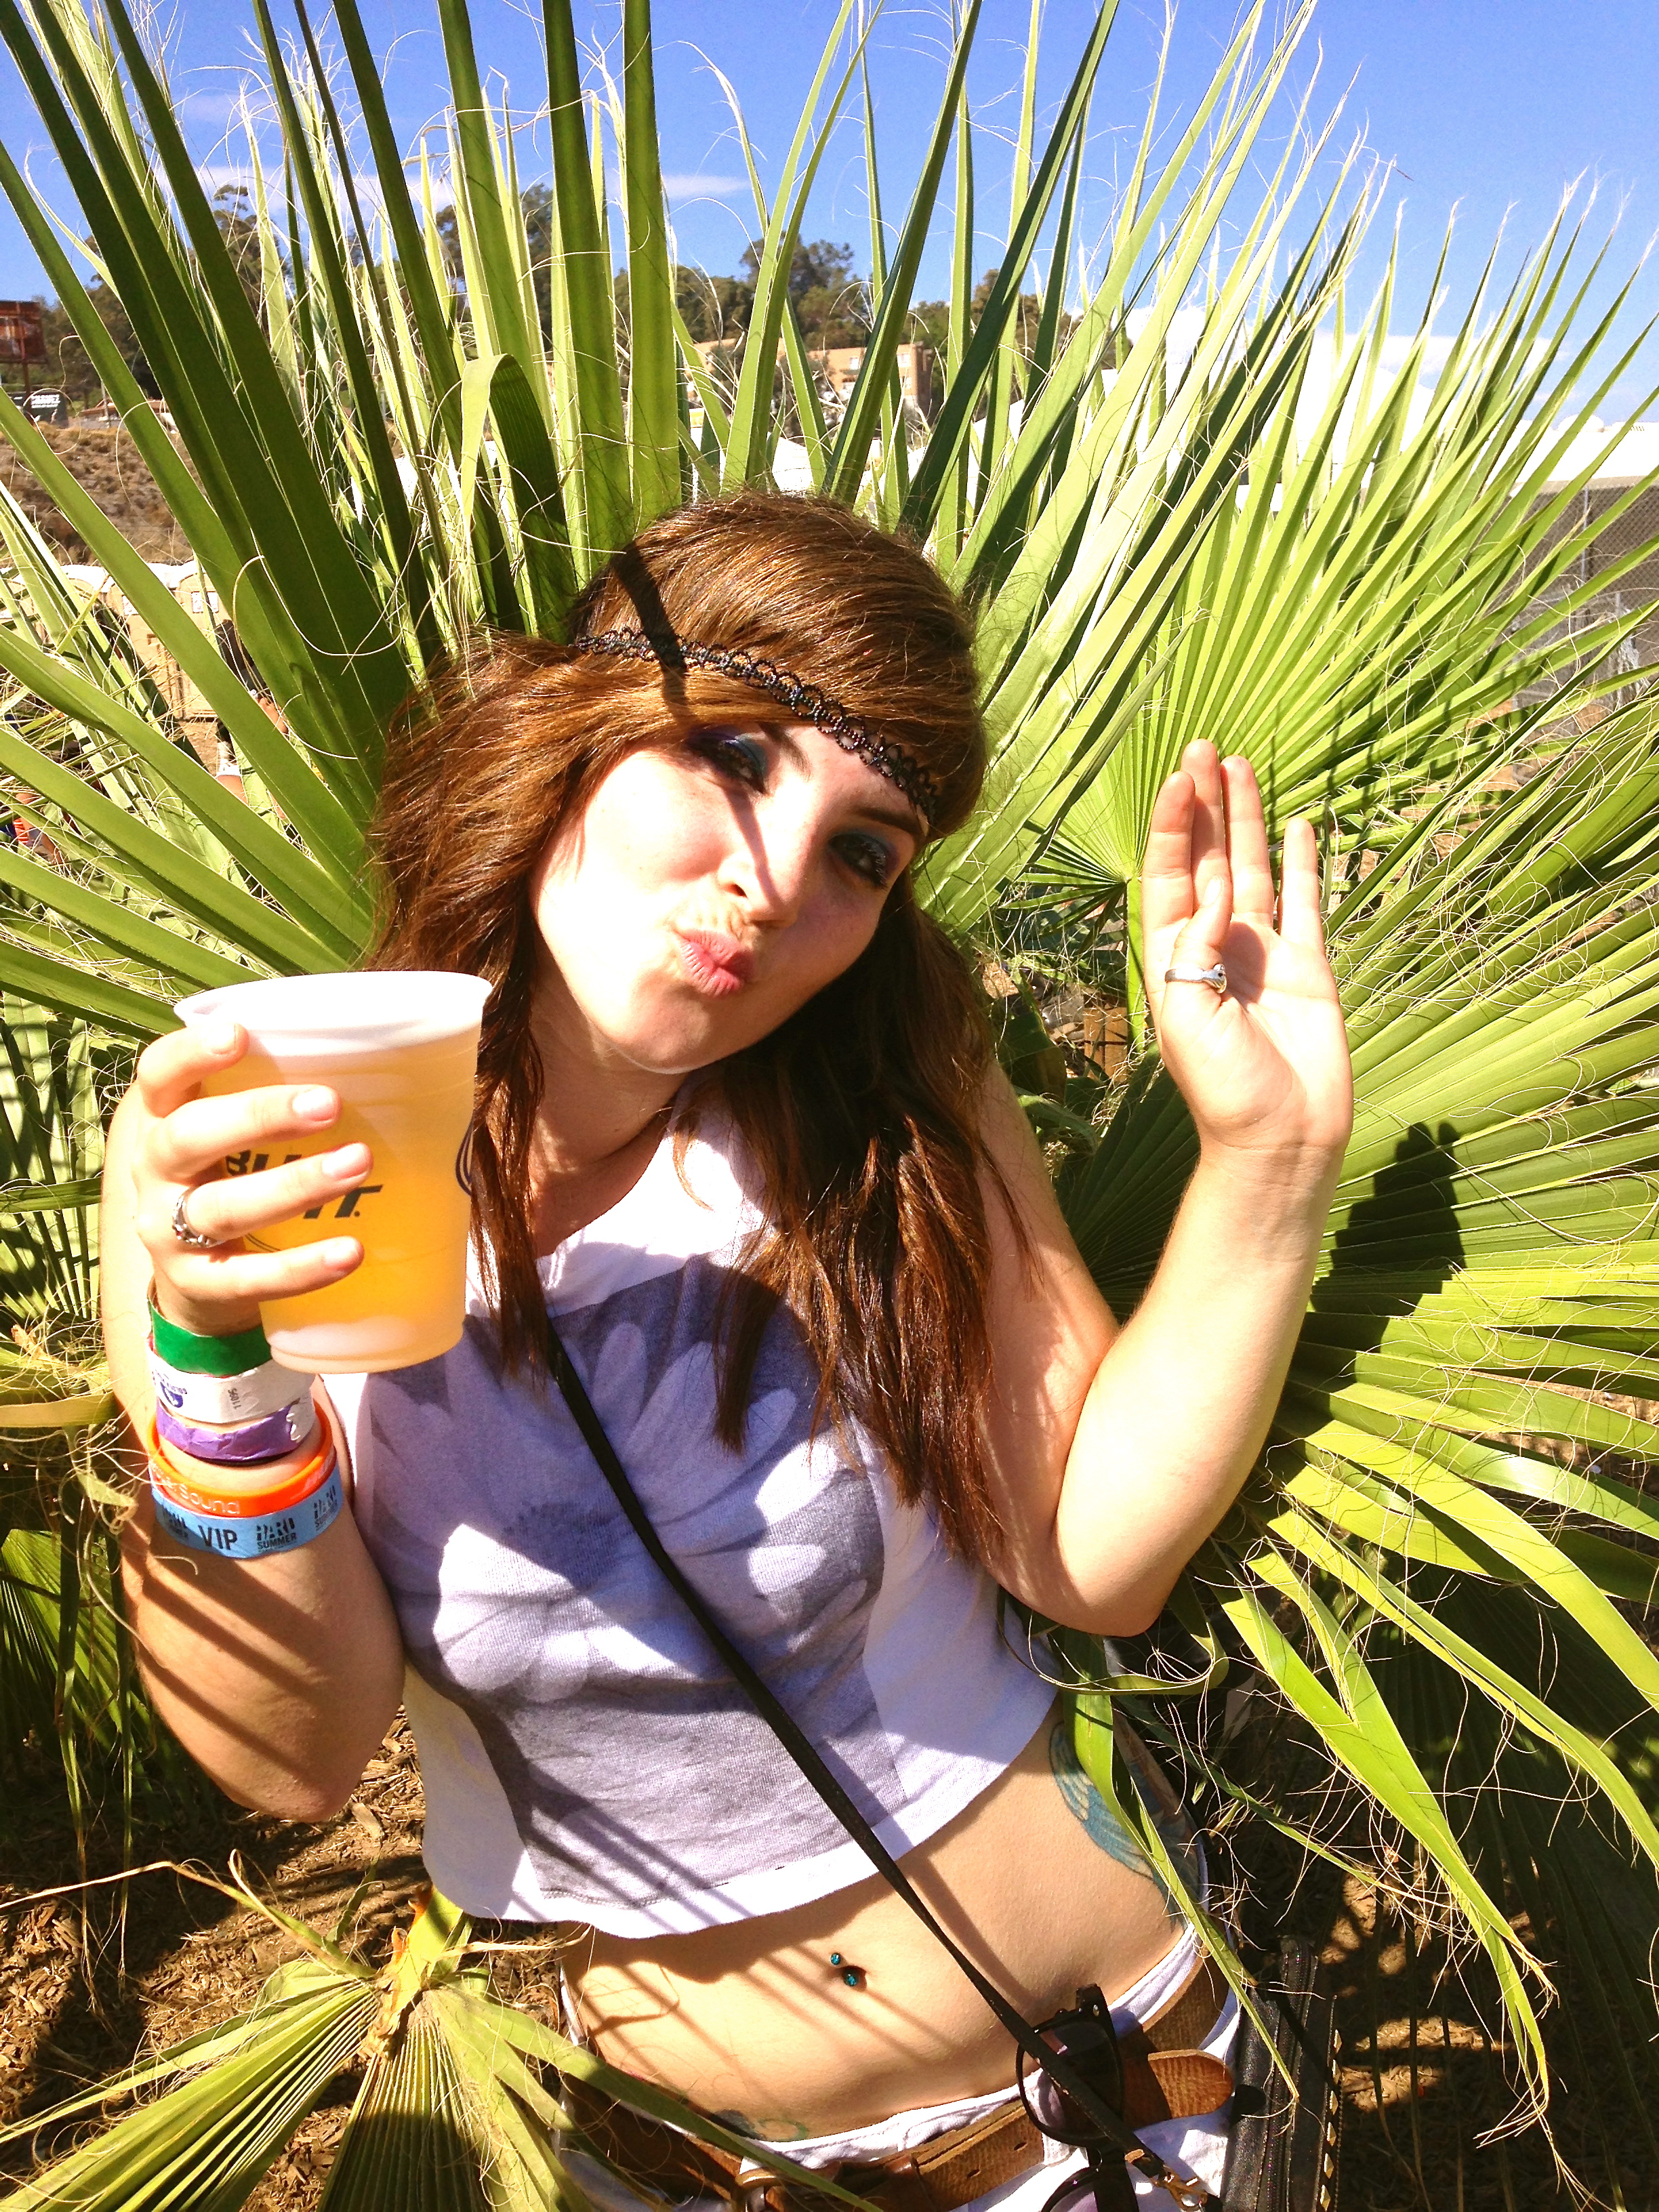 Coachella Tent Camping 101: Tips, Tricks, and Helpful Hints